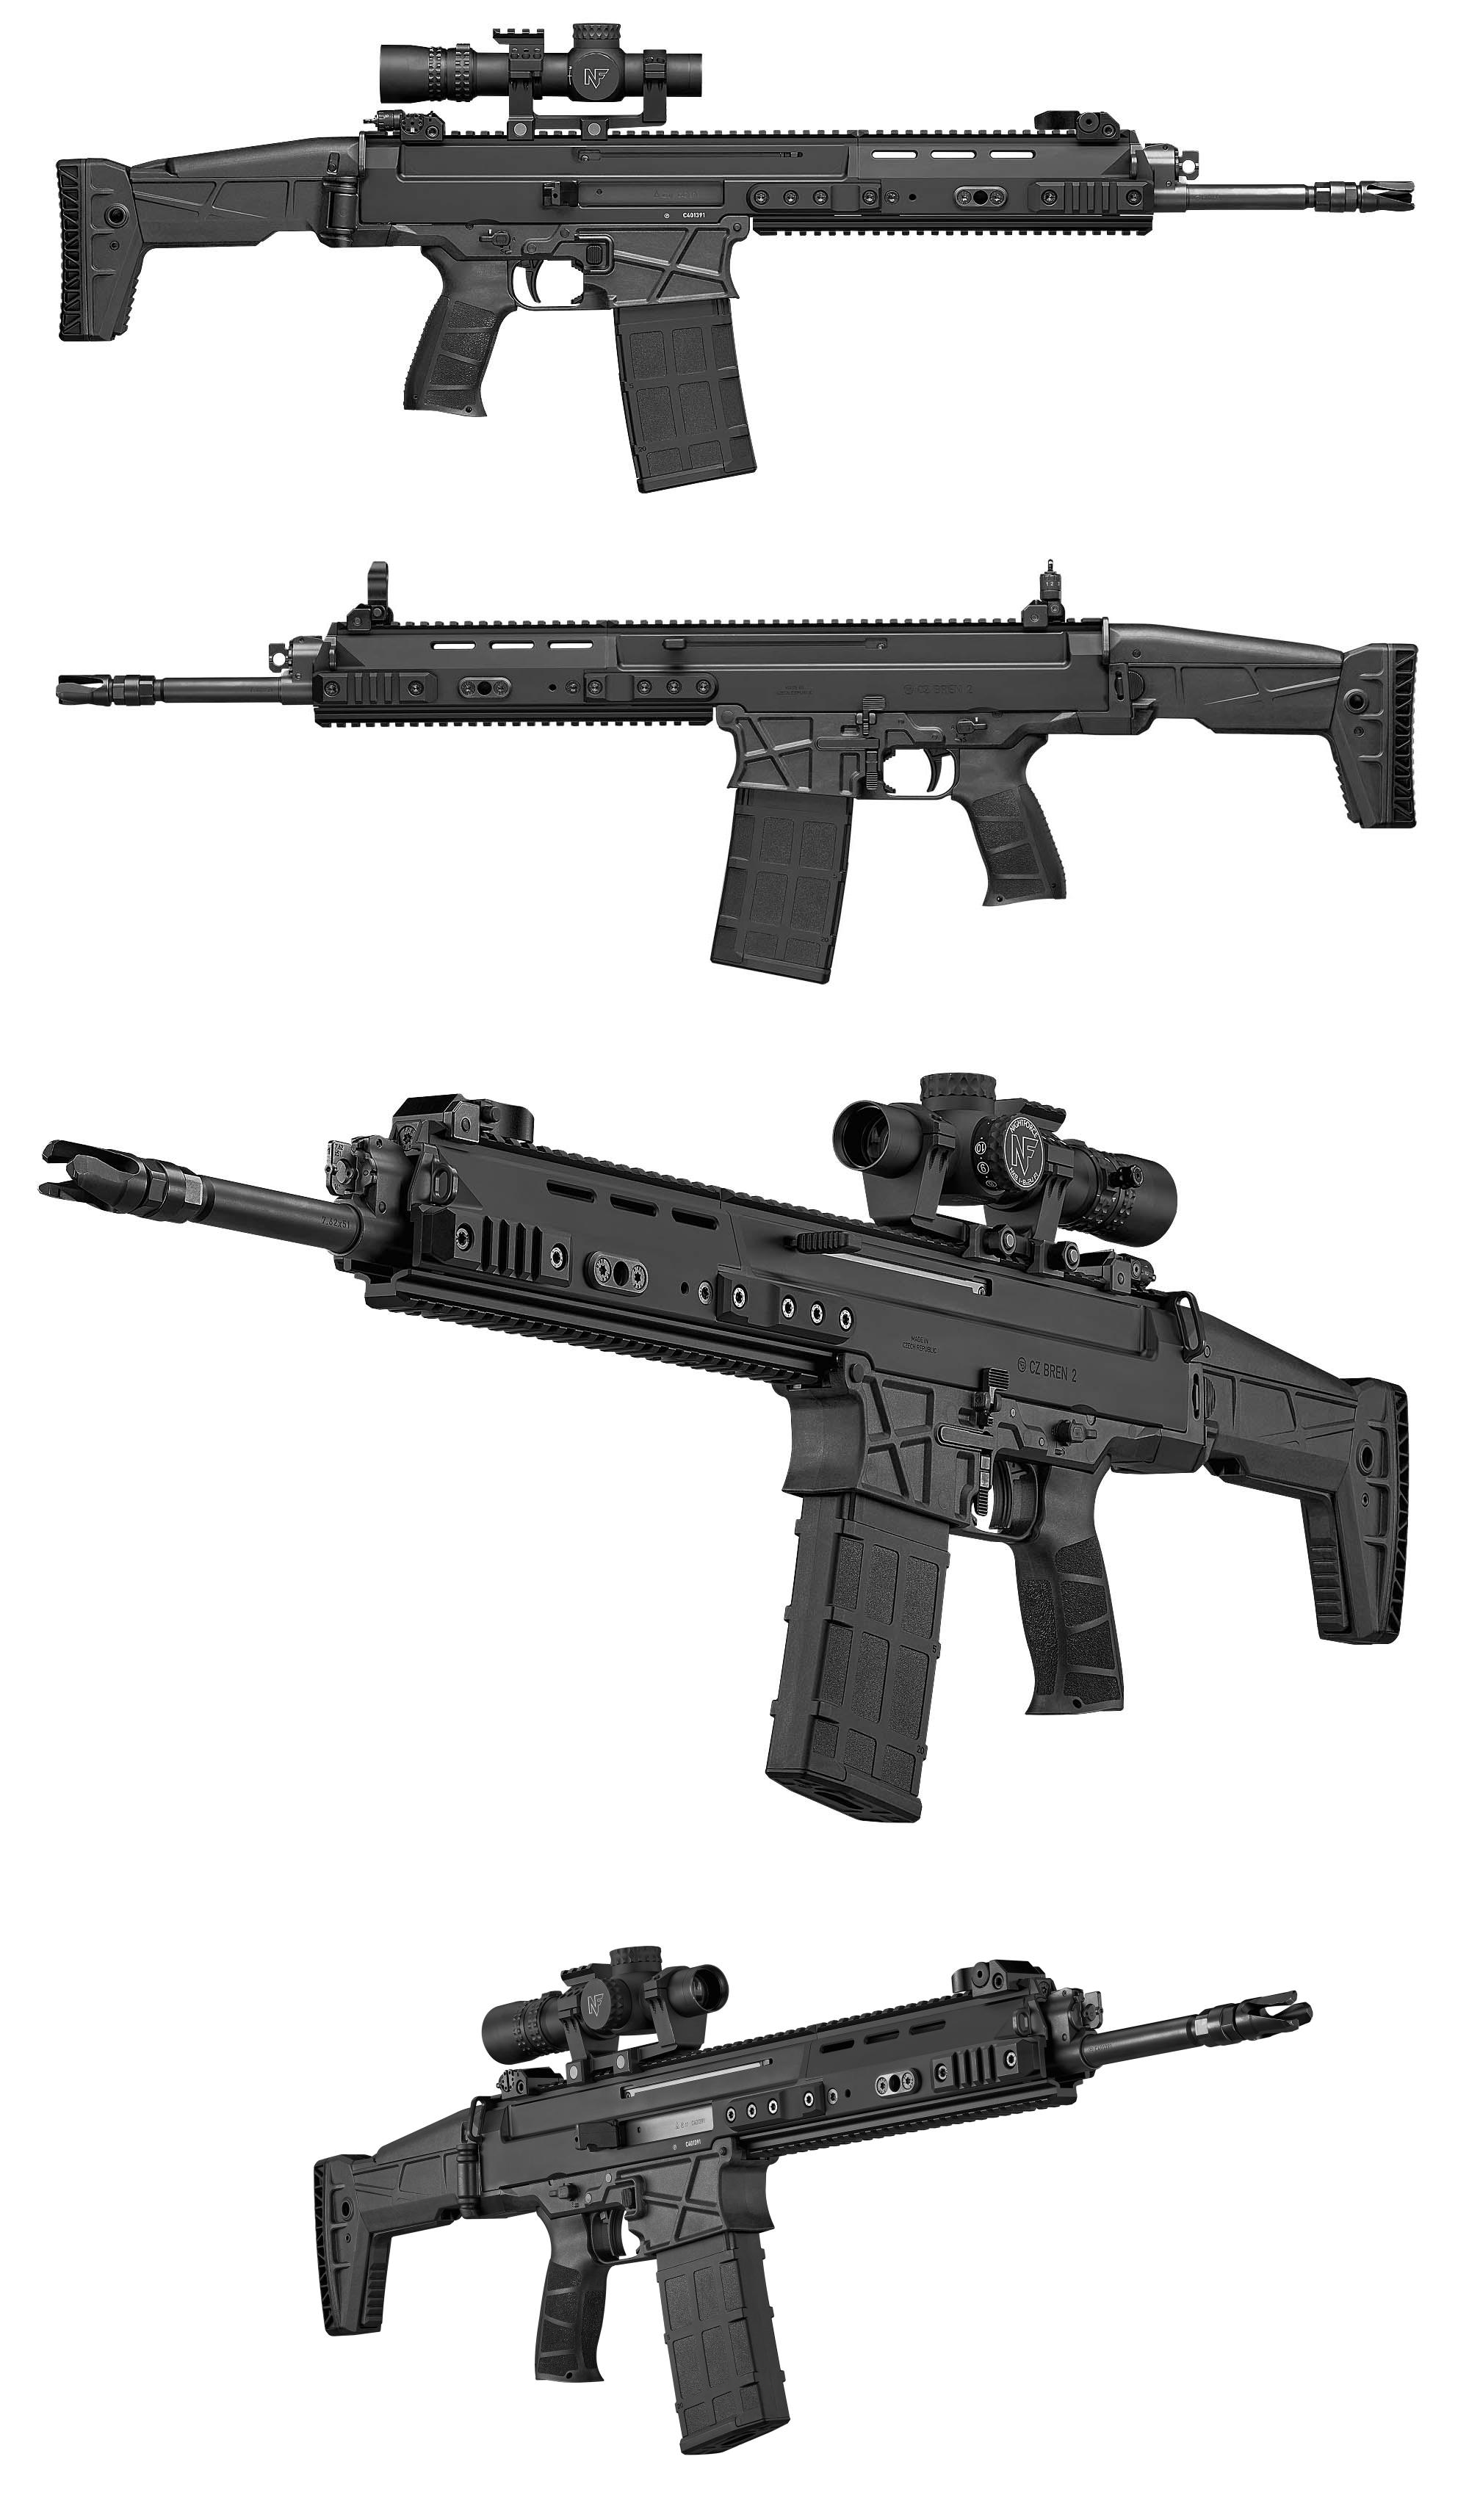 CZ Bren 2 BR 7 62x51 | Military | Guns, Firearms, Weapons